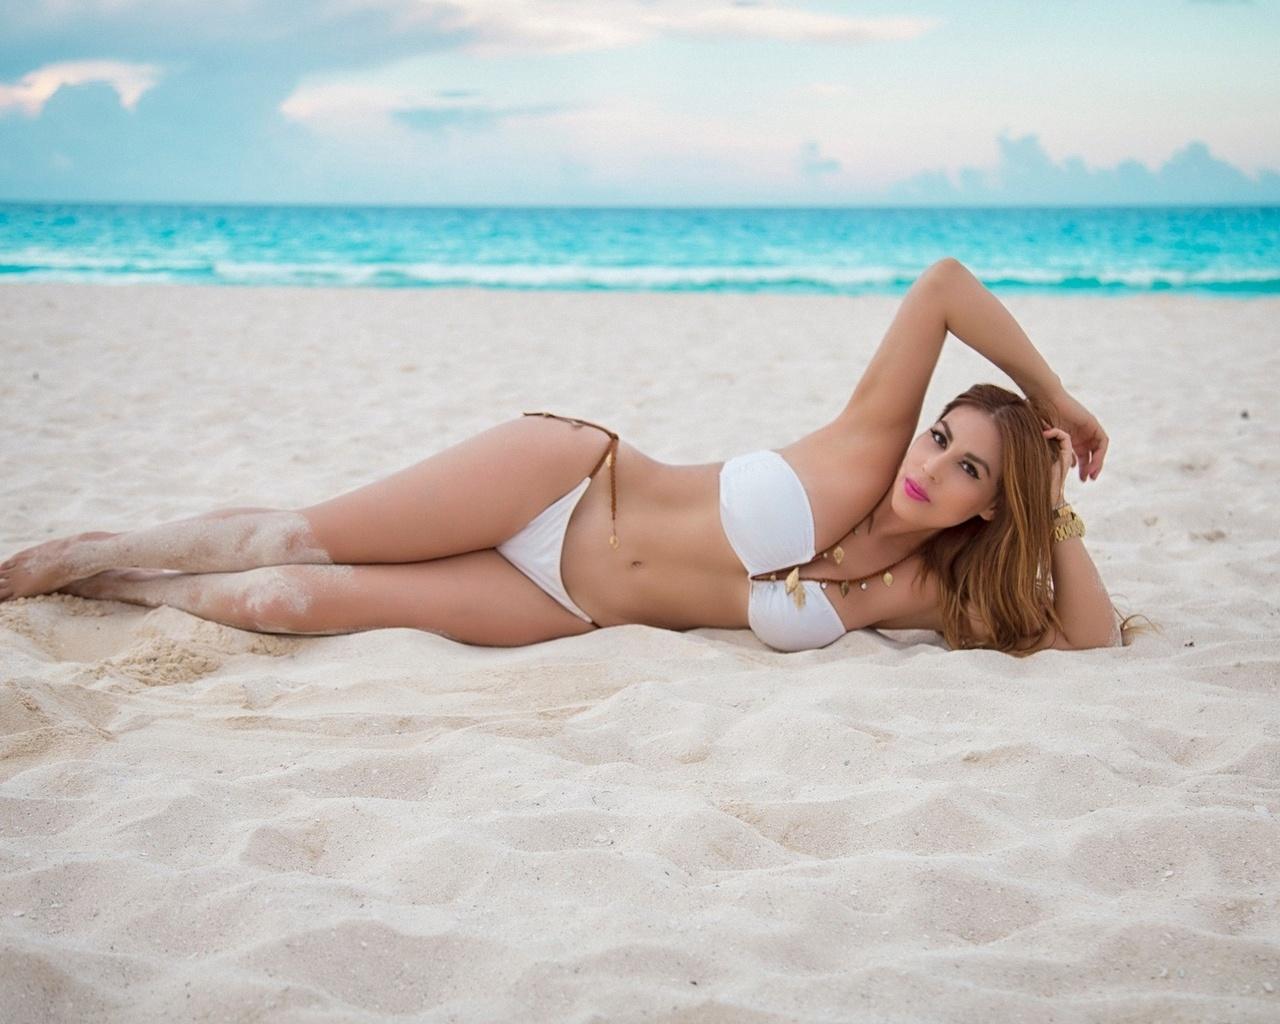 Картинка девчонки на пляже